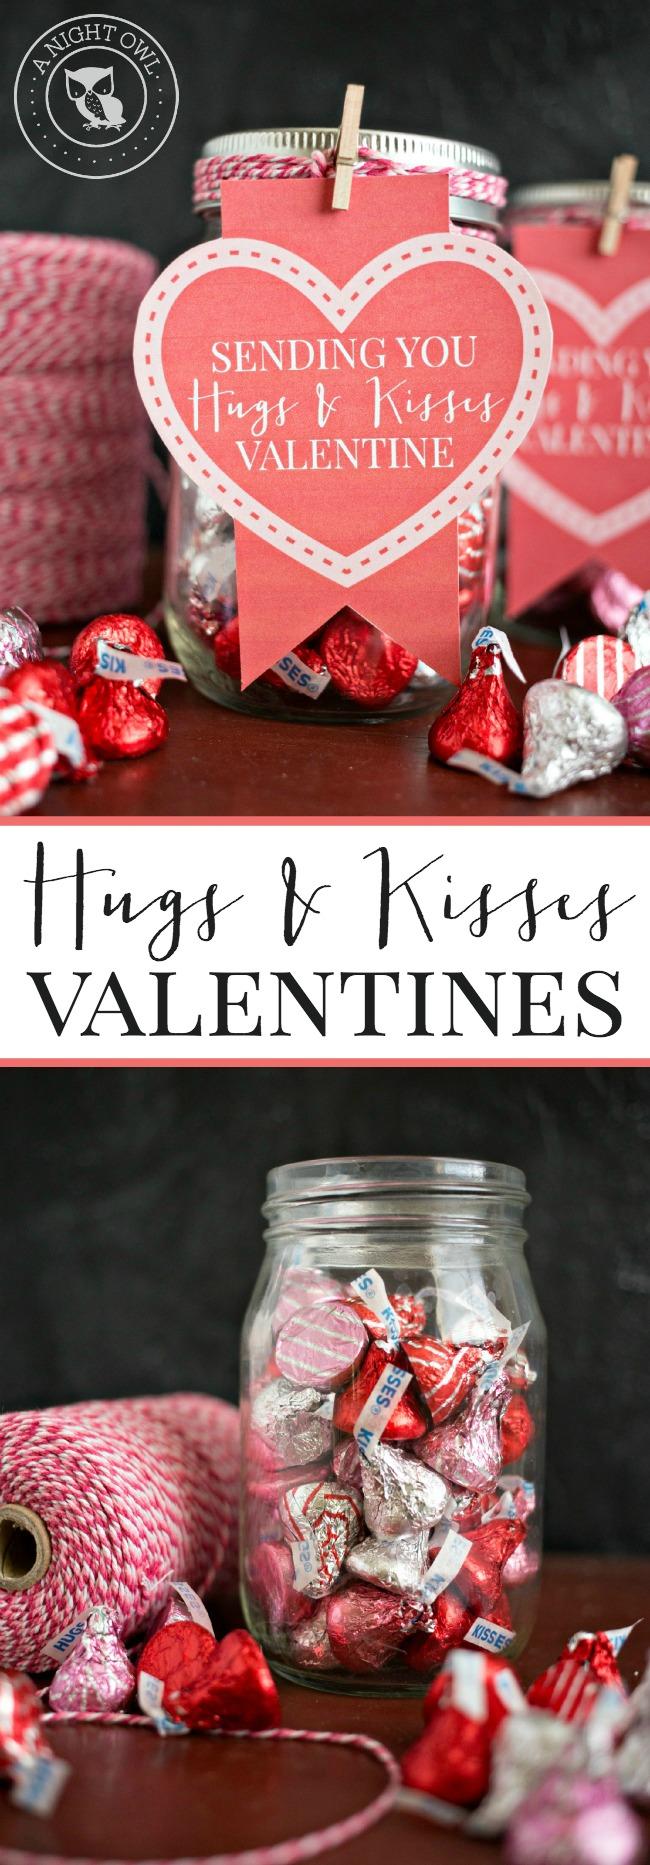 Hugs and Kisses Mason Jar Valentines | anightowlblog.com